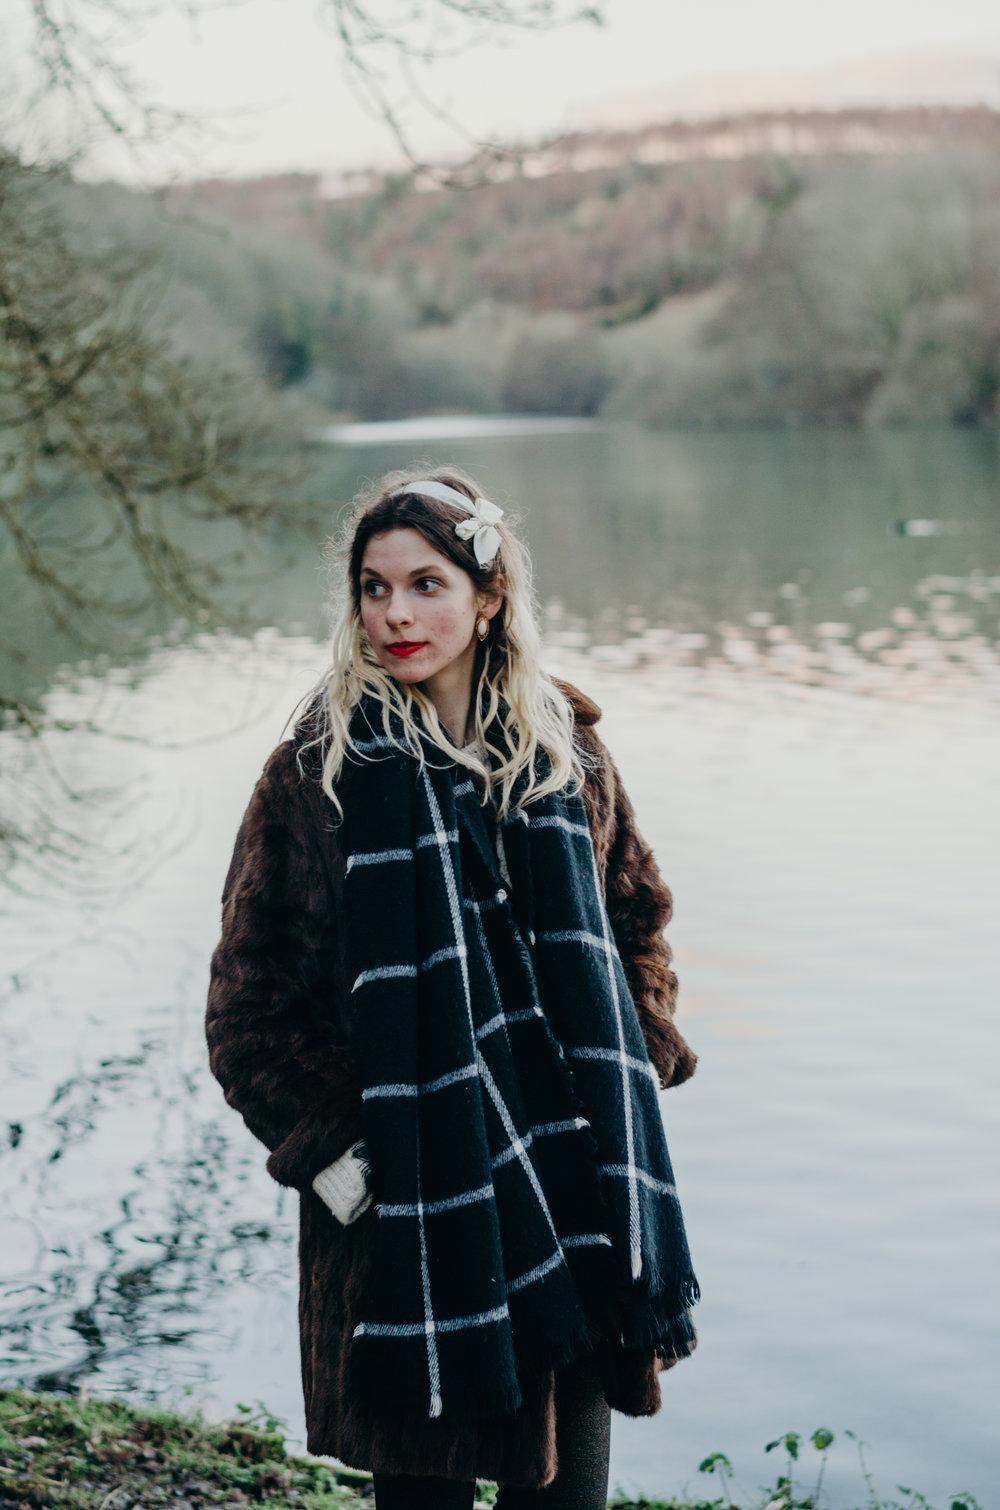 Arundel - Aiste Saulyte Photography - 2018-01-05-100.jpg